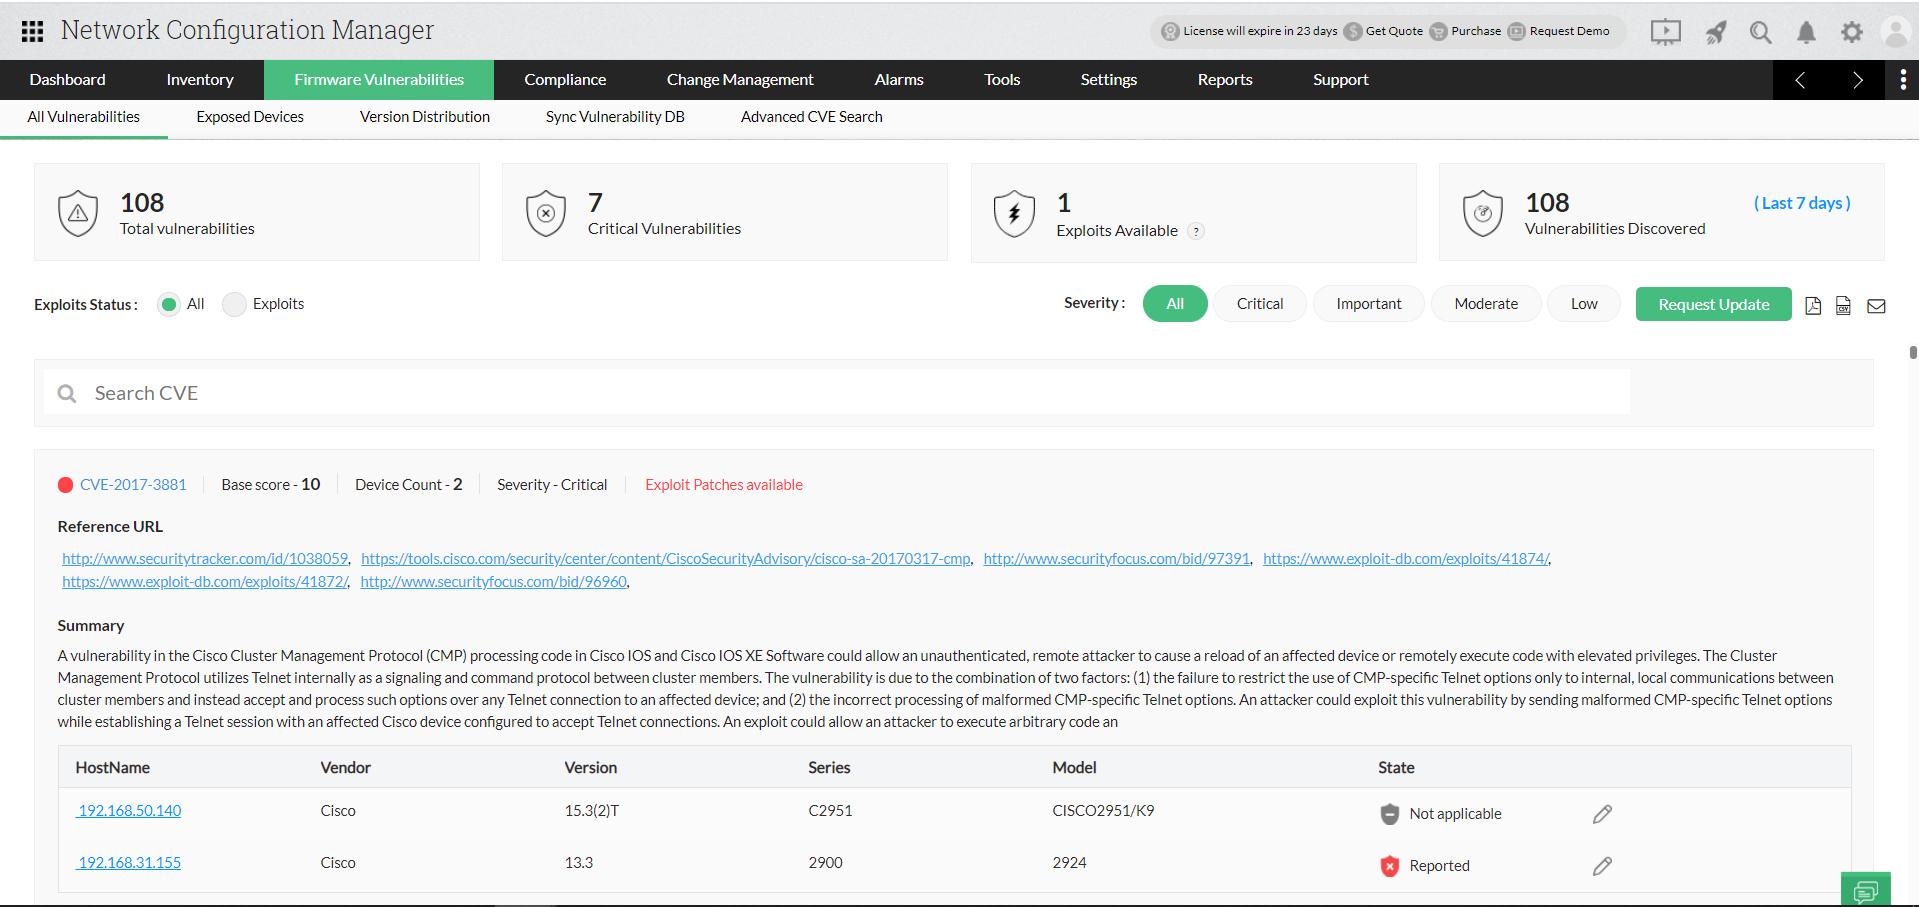 Firmware vulnerability - all vulnerabilities - ManageEngine Network Configuration Manager